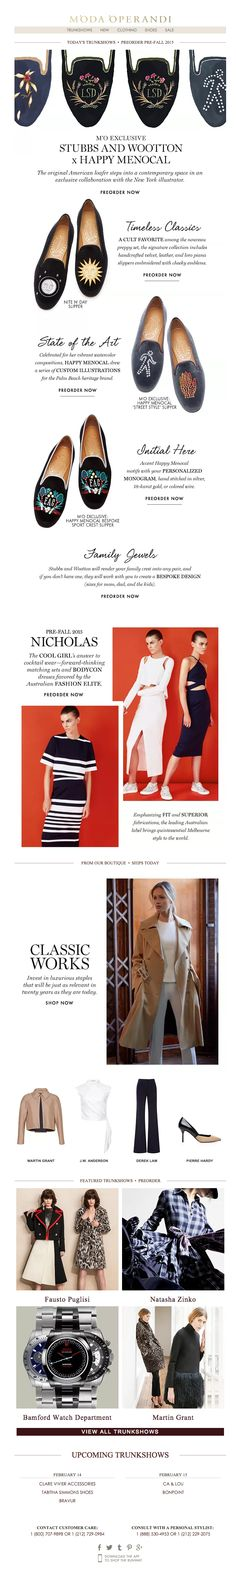 Moda Operandi   newsletter   fashion email   fashion design   email   email marketing   email inspiration   e-mail